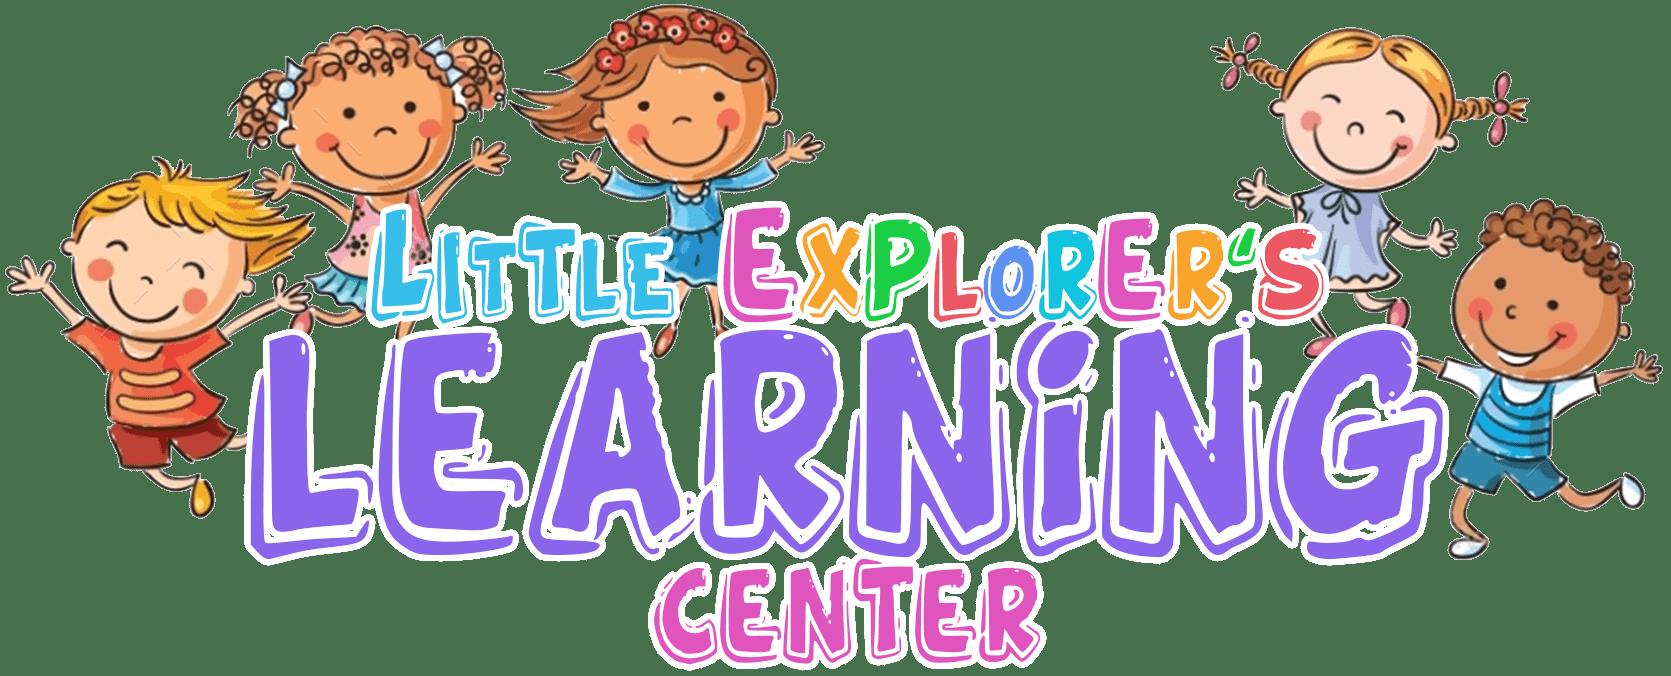 Village-Learning-Center-Daycare-Logo-007